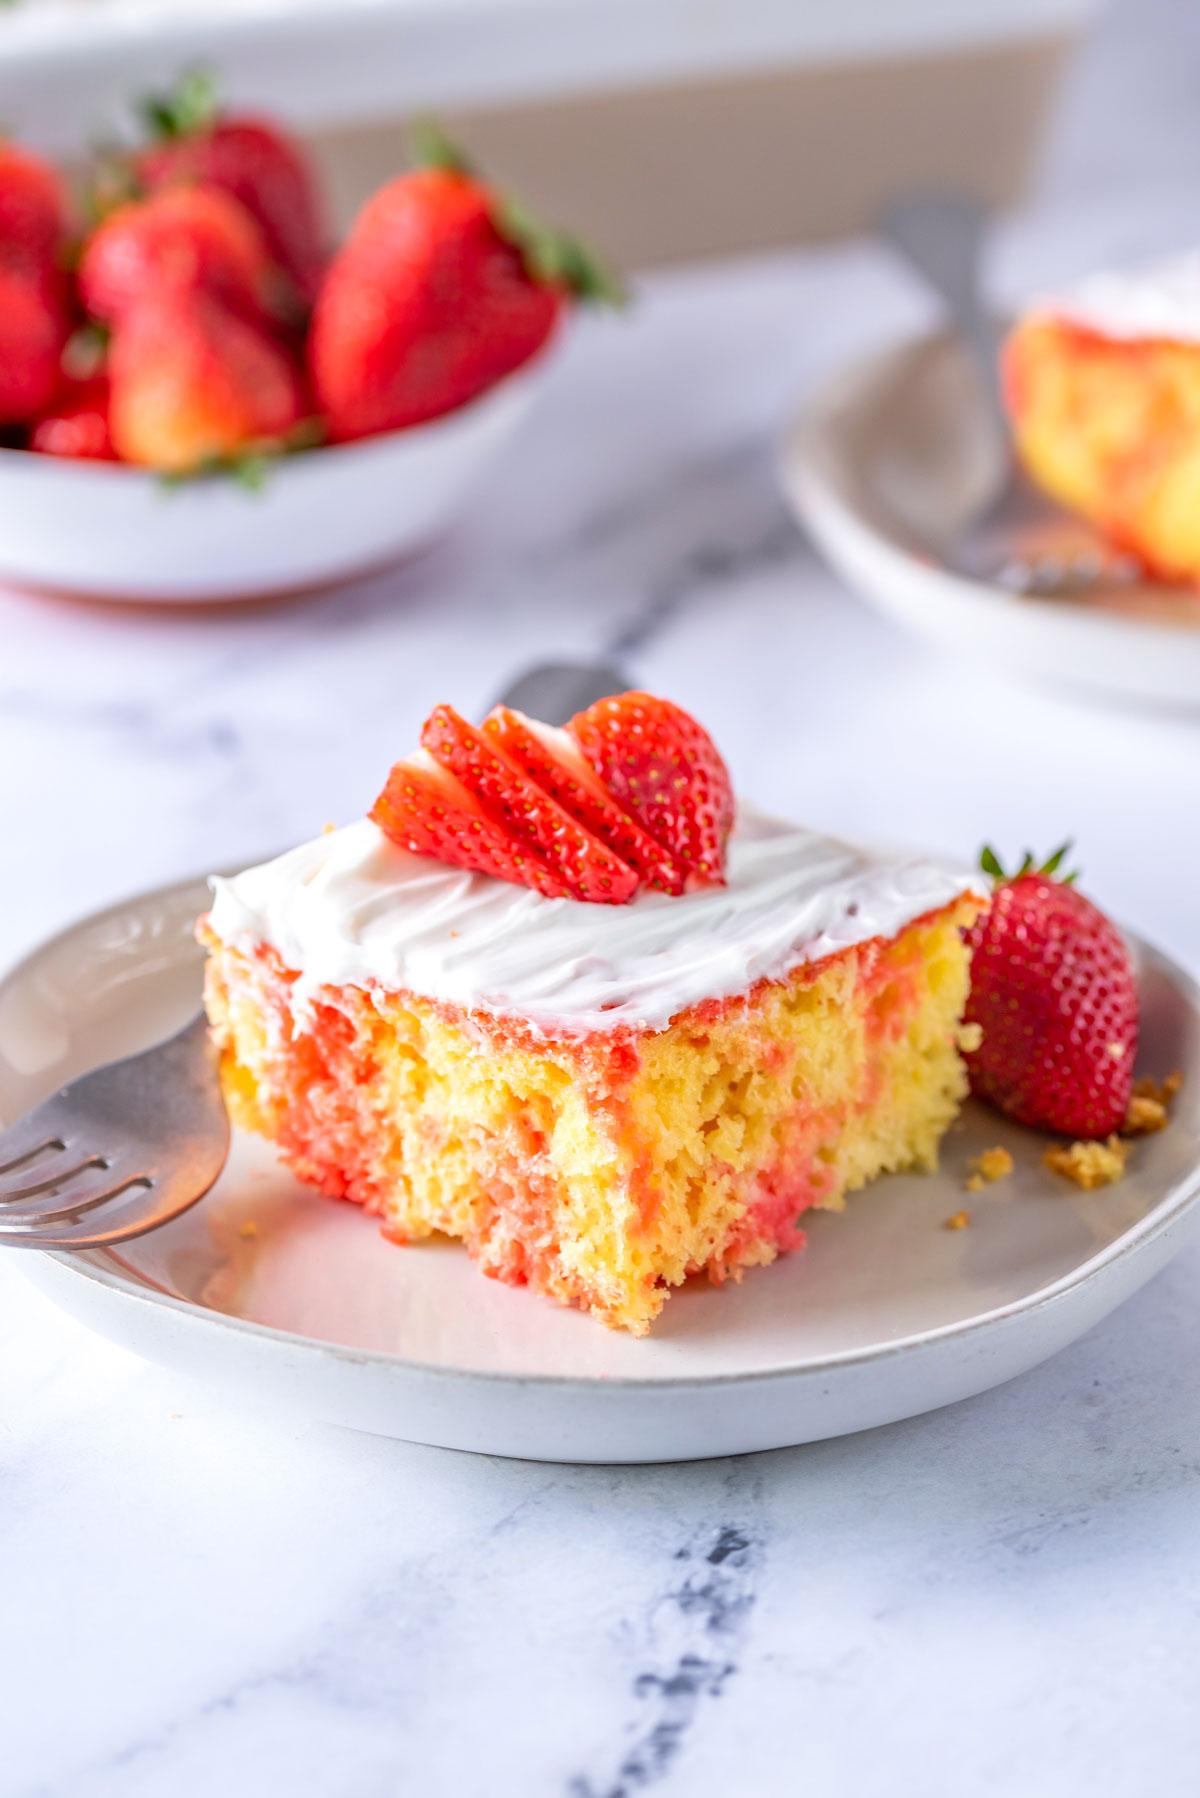 a slice of strawberry poke cake